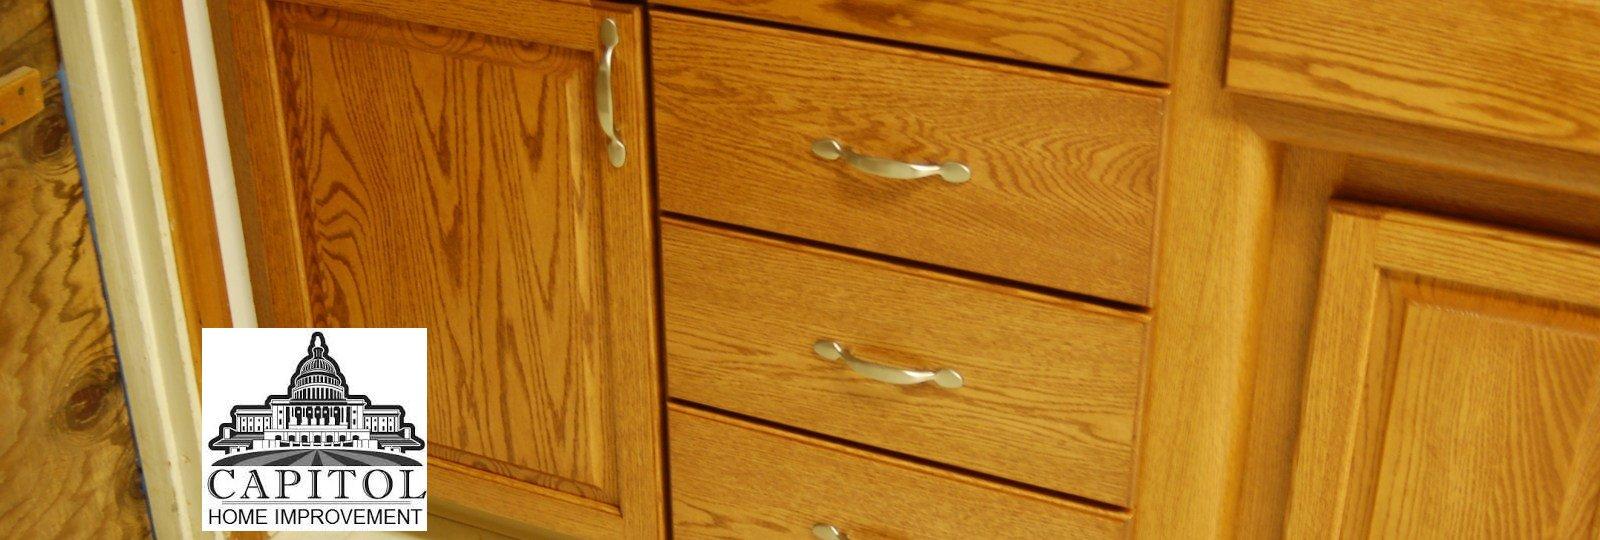 tacoma gig harbor wa granite countertops kitchen cabinet refacing